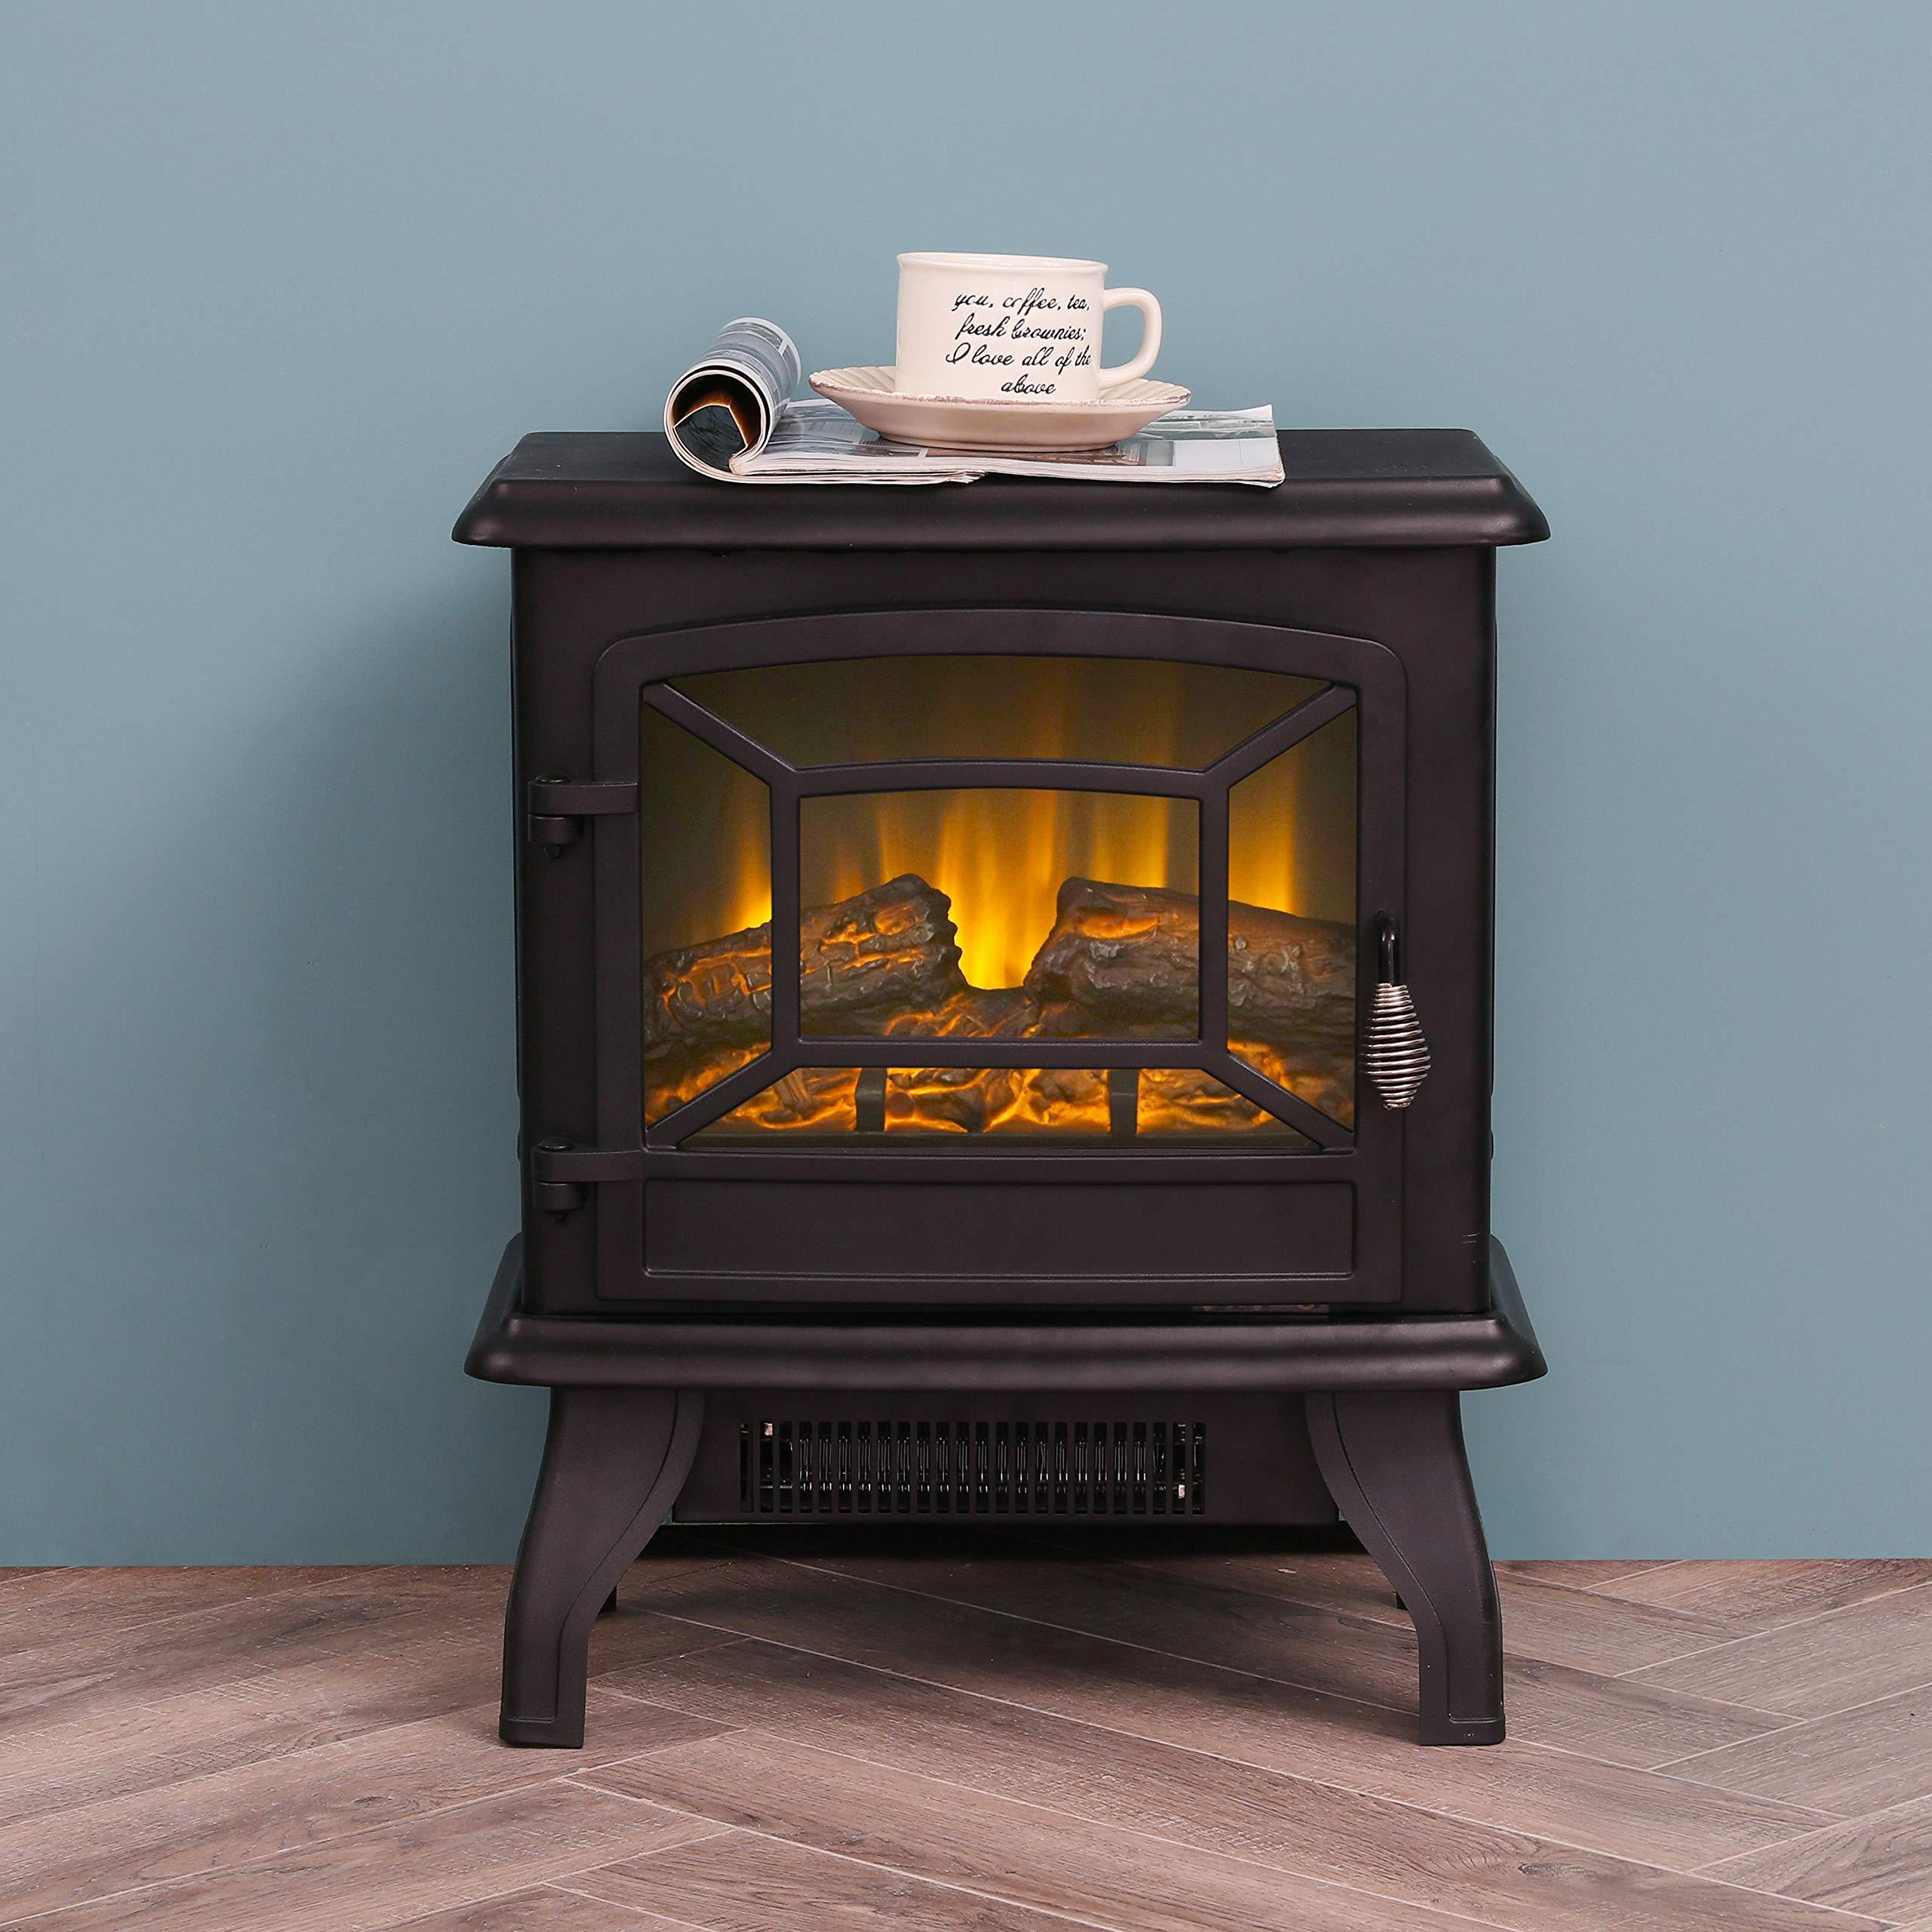 LOKATSE HOME Freestanding Overheating Protection